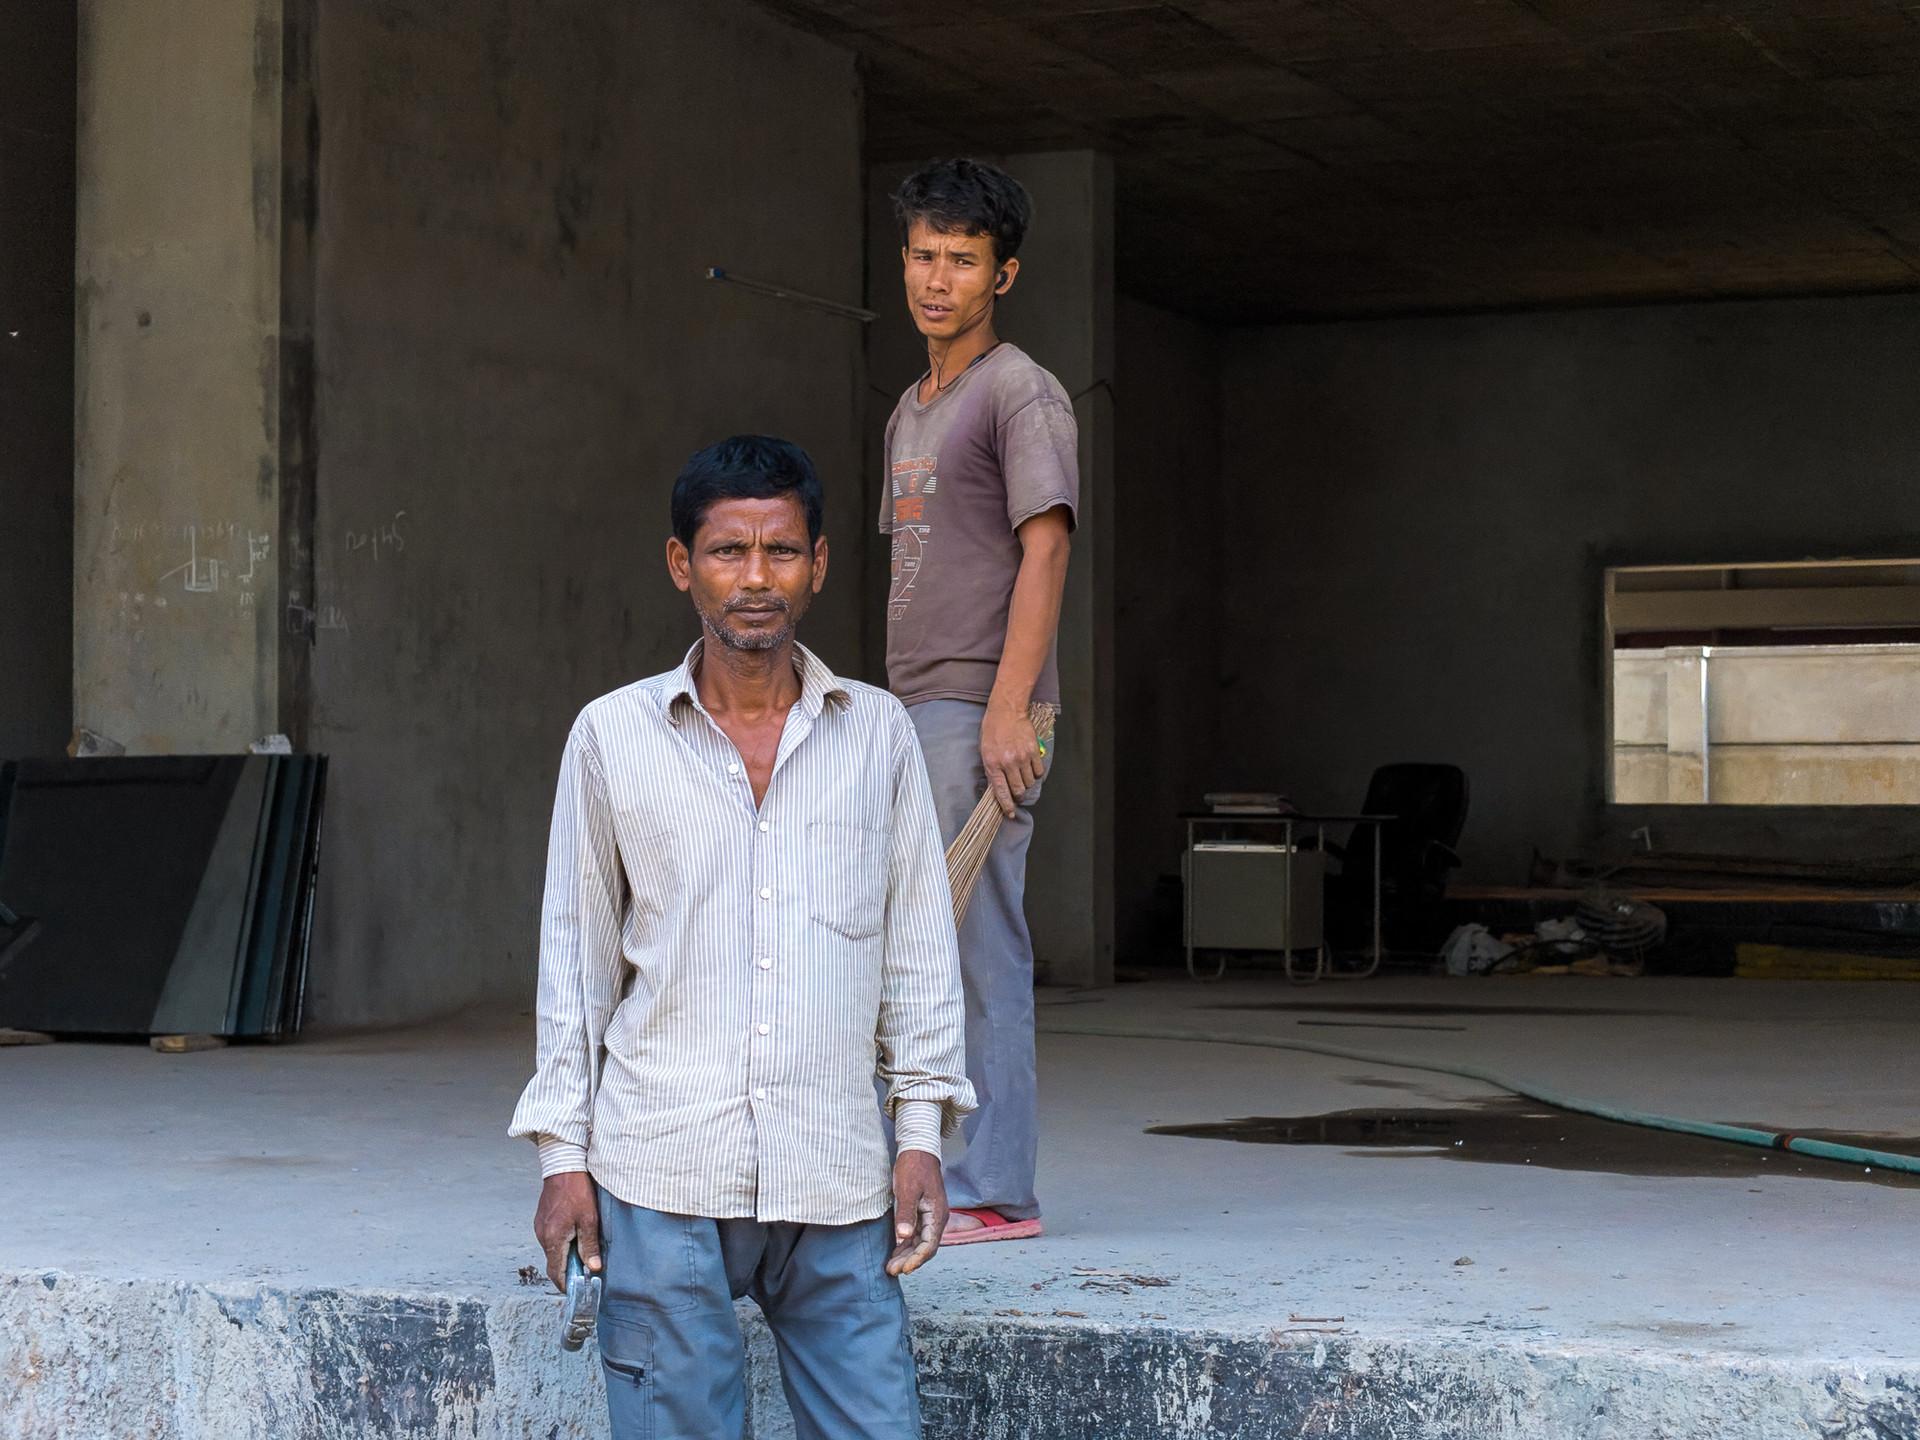 Portrait of Construction Workers